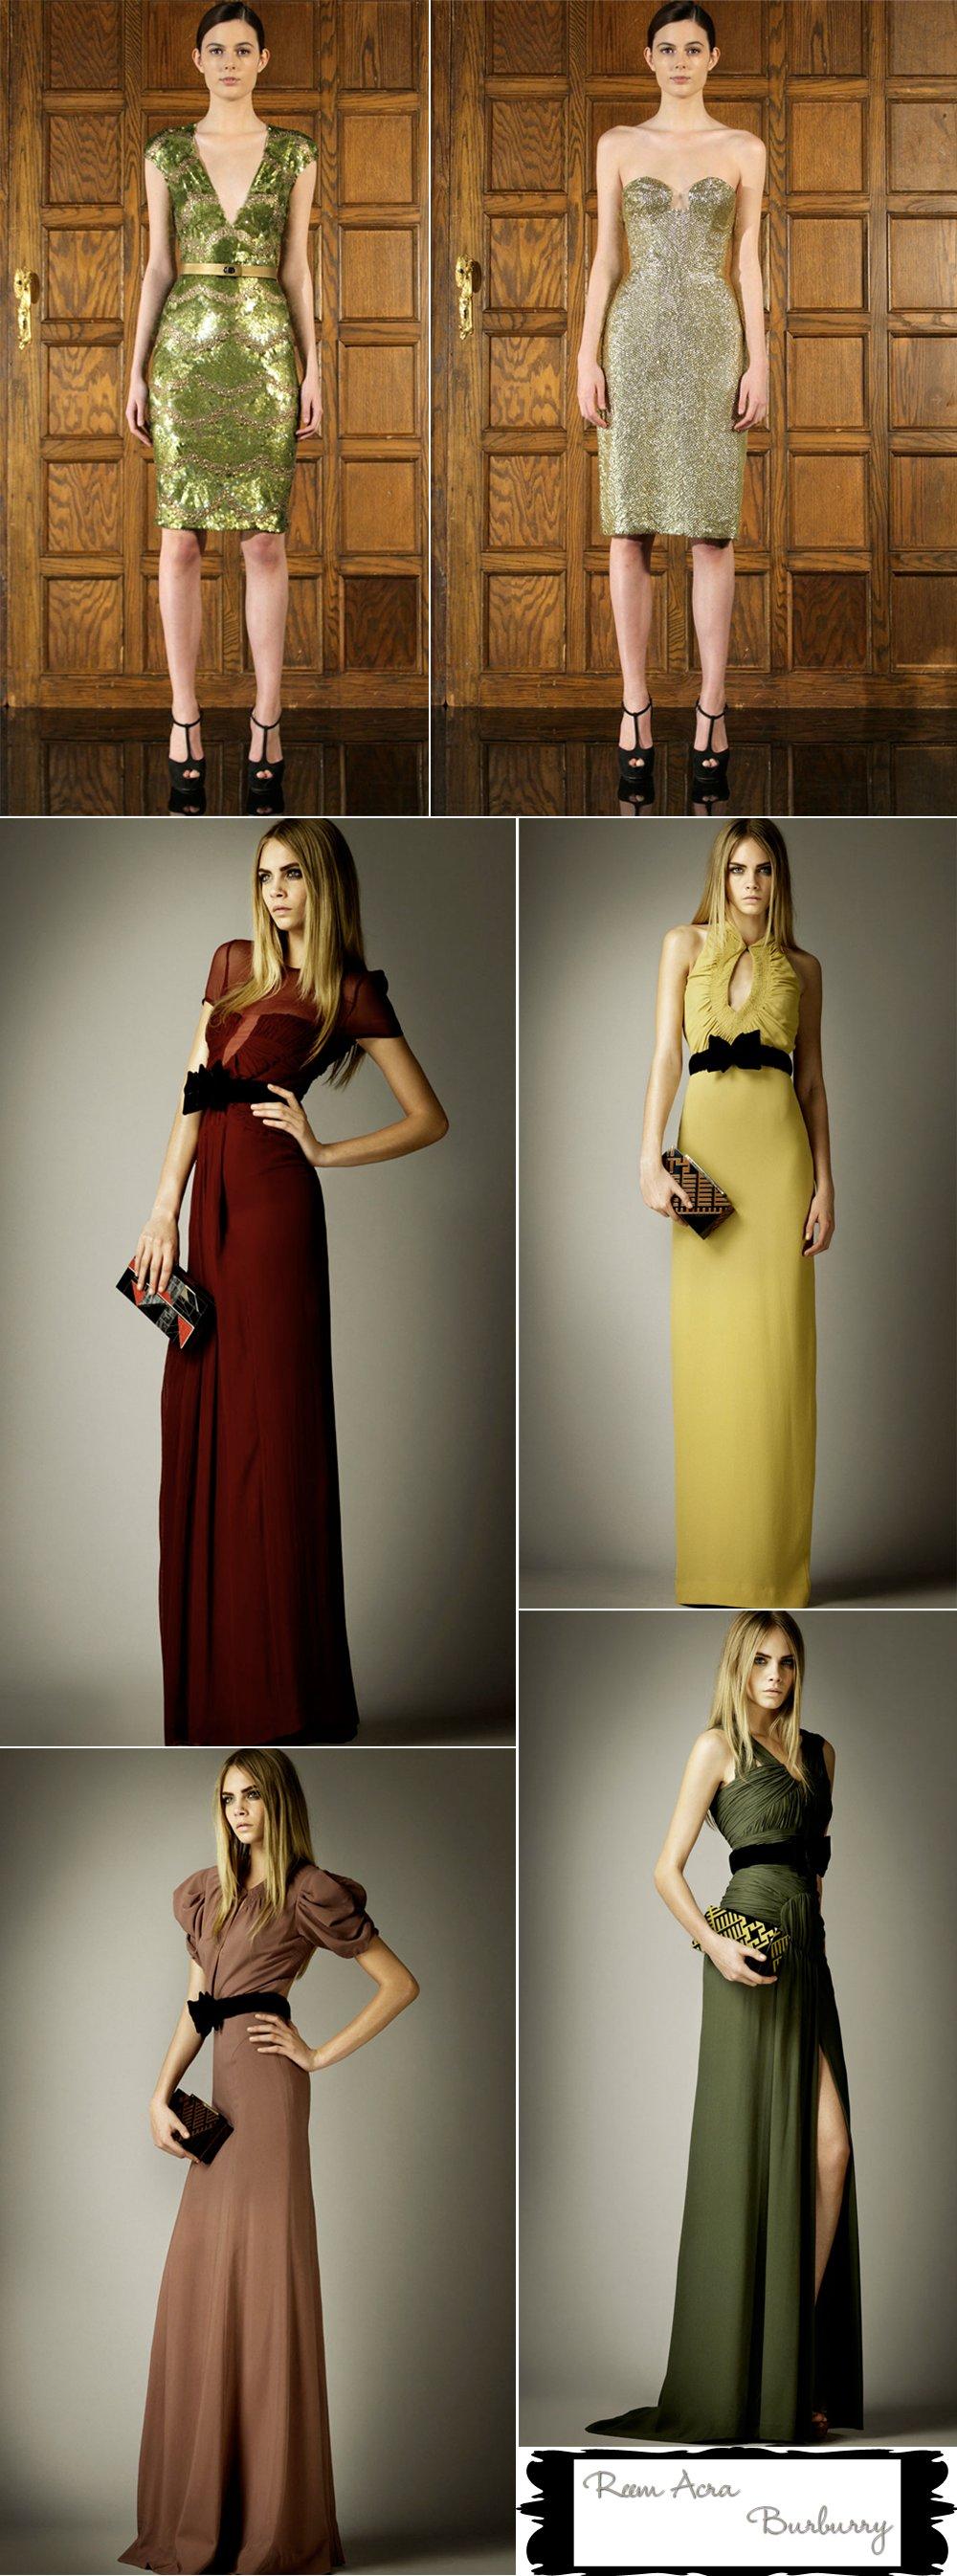 Wedding-dress-bridesmaids-dresses-inspiration-pre-fall-2012-reem-acra.full